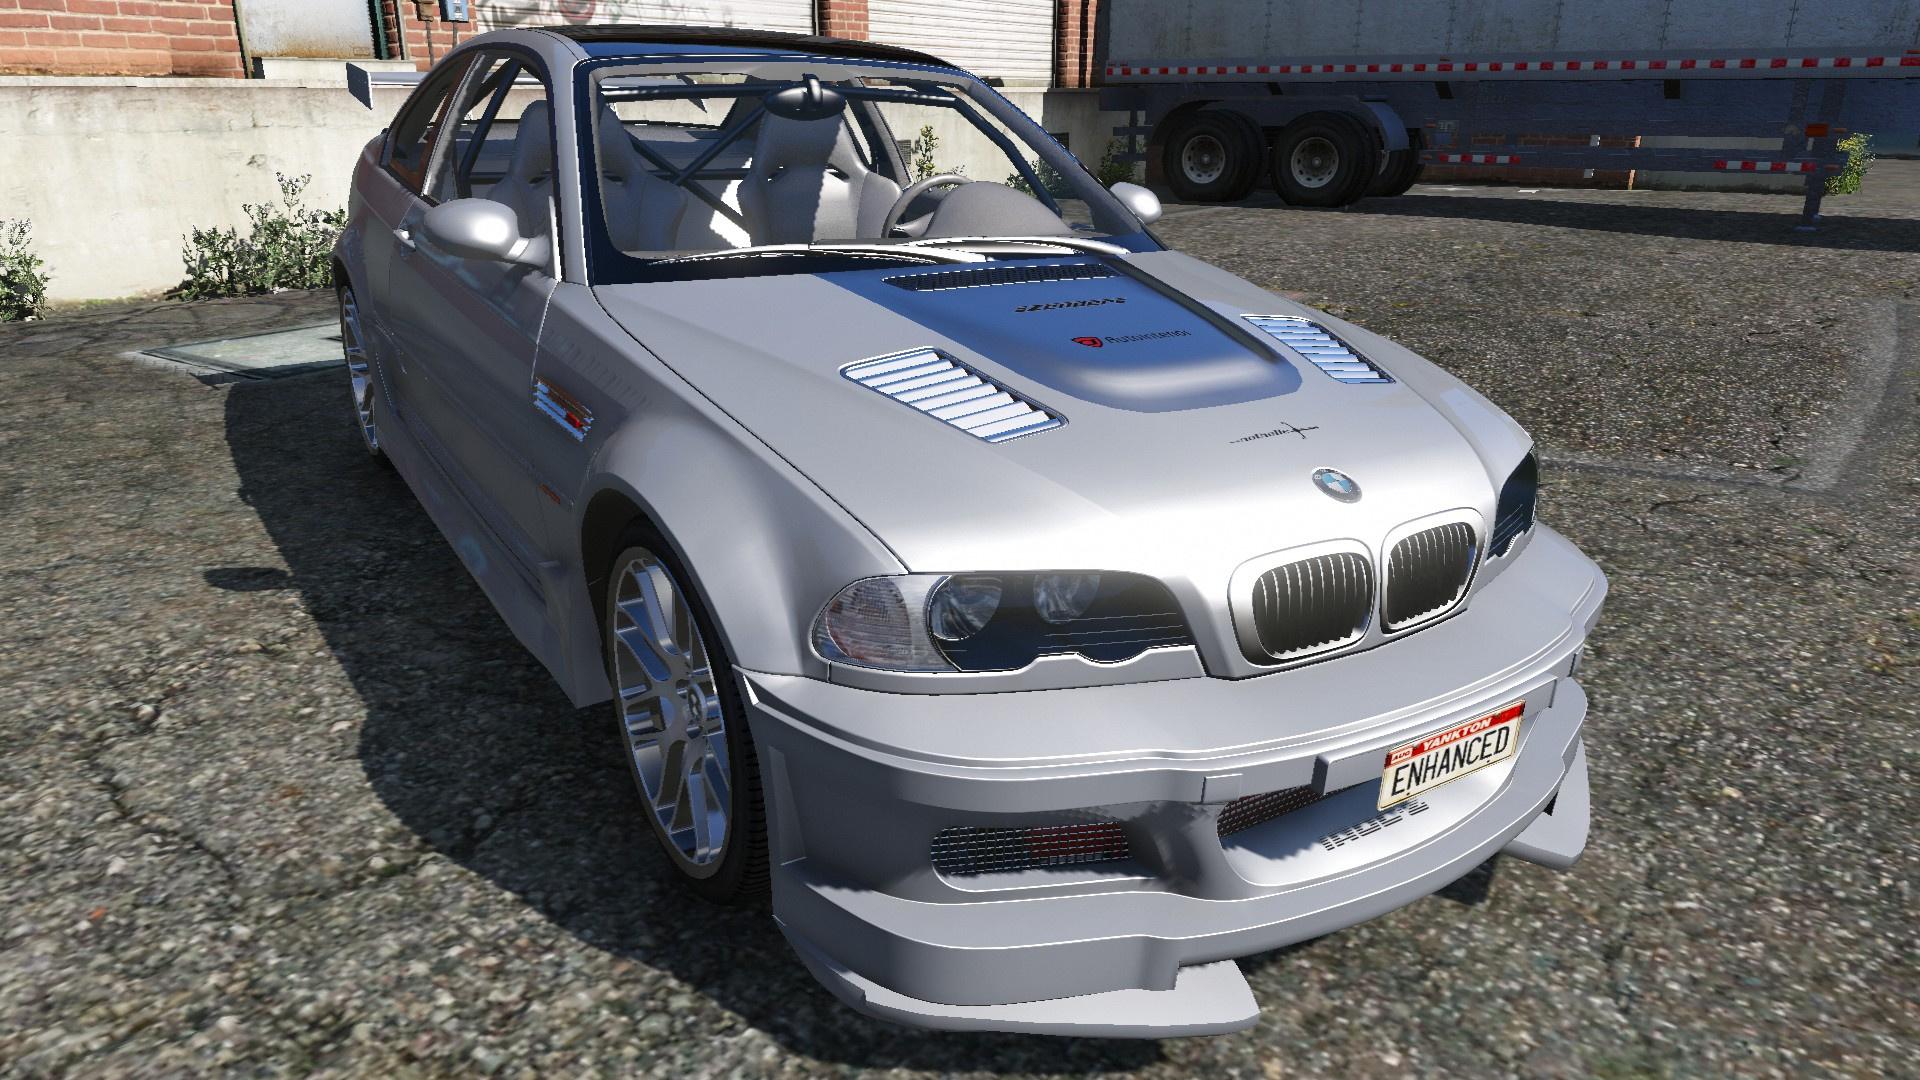 2002 Bmw M3 Gtr Street Version Gta5 Mods Com